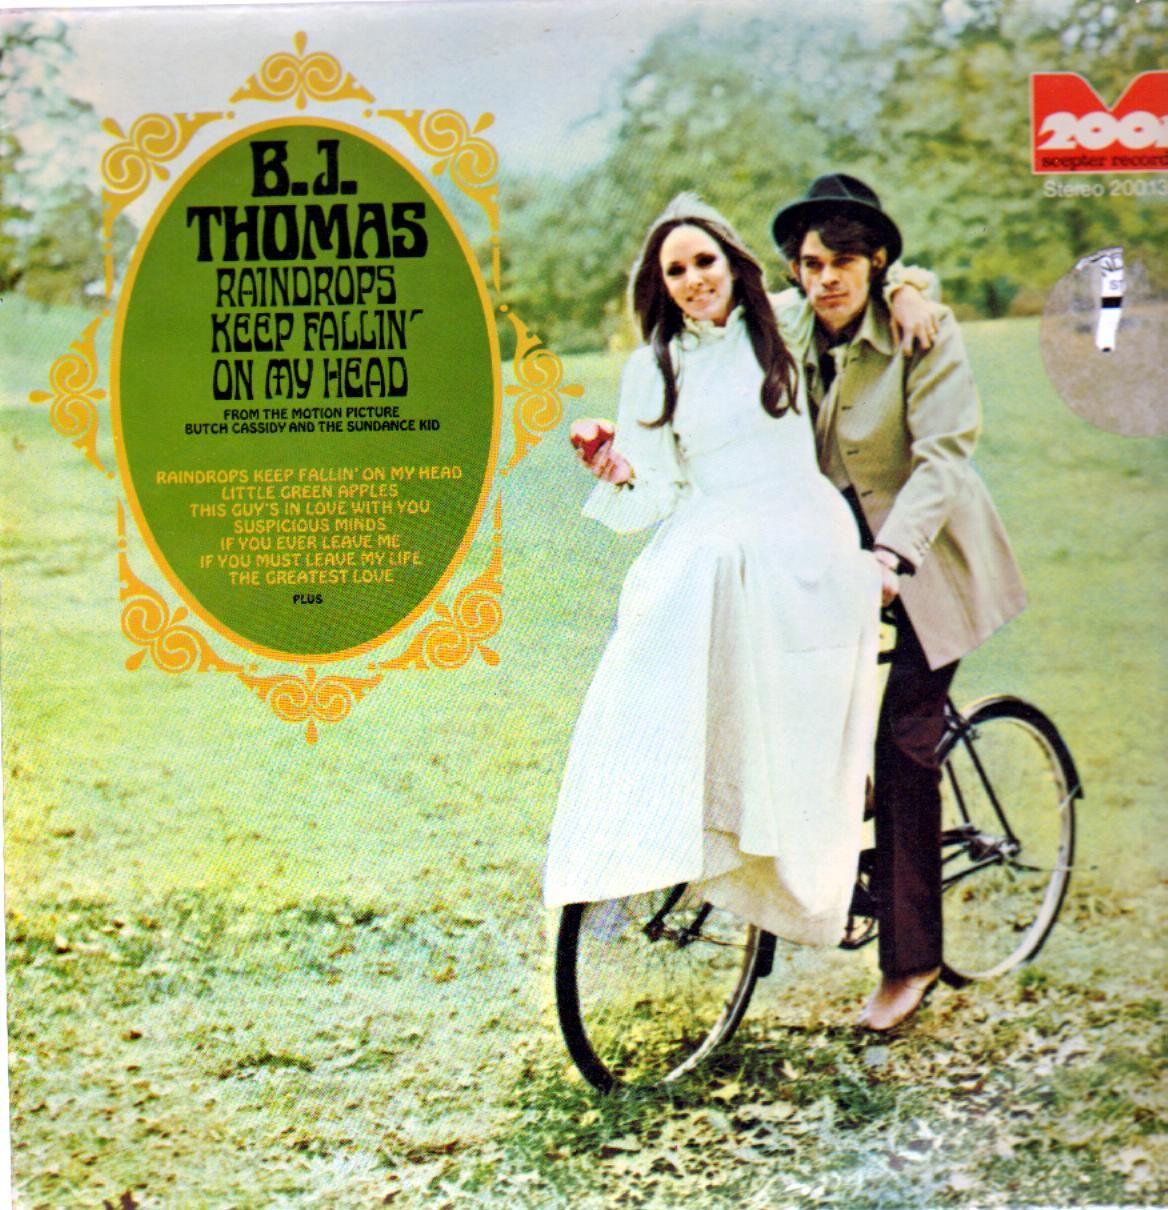 b.j. thomas – raindrops keep falling on my head